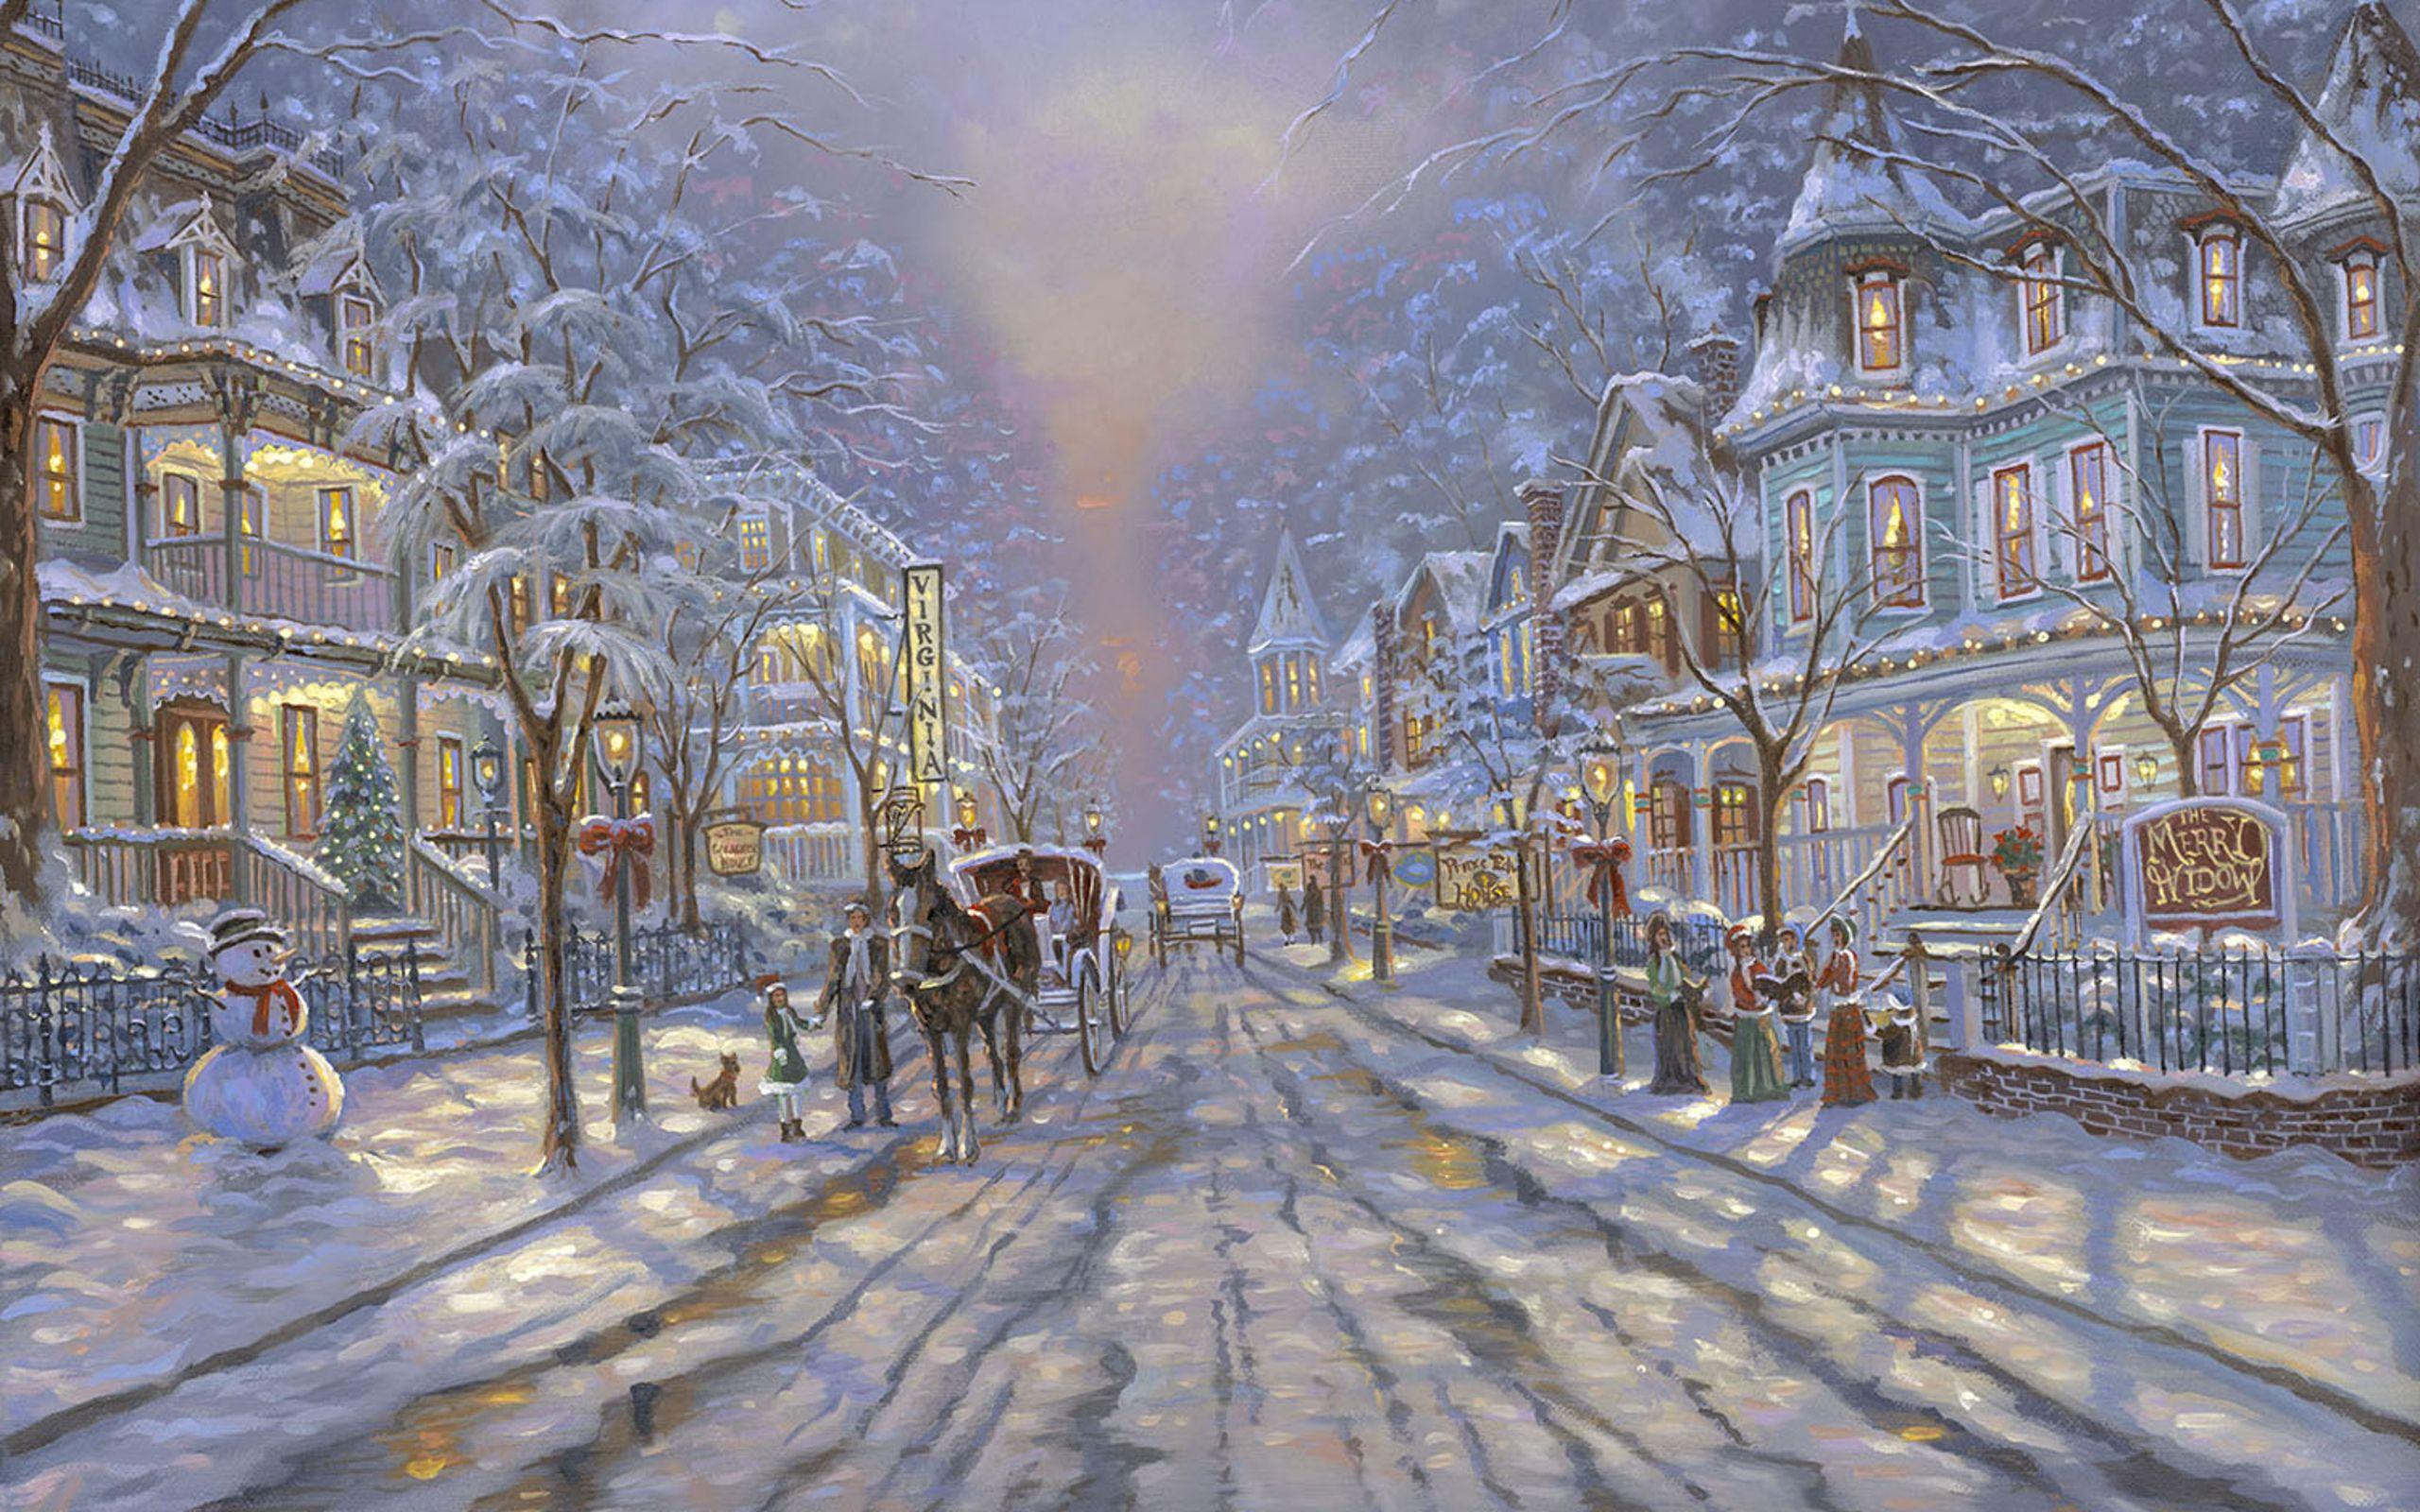 Christmas Paintings Wallpaper Wallpaper Painting Christmas Street Cottages Free Desktop Wallpape Winter Painting Winter Wallpaper Desktop Winter Wallpaper